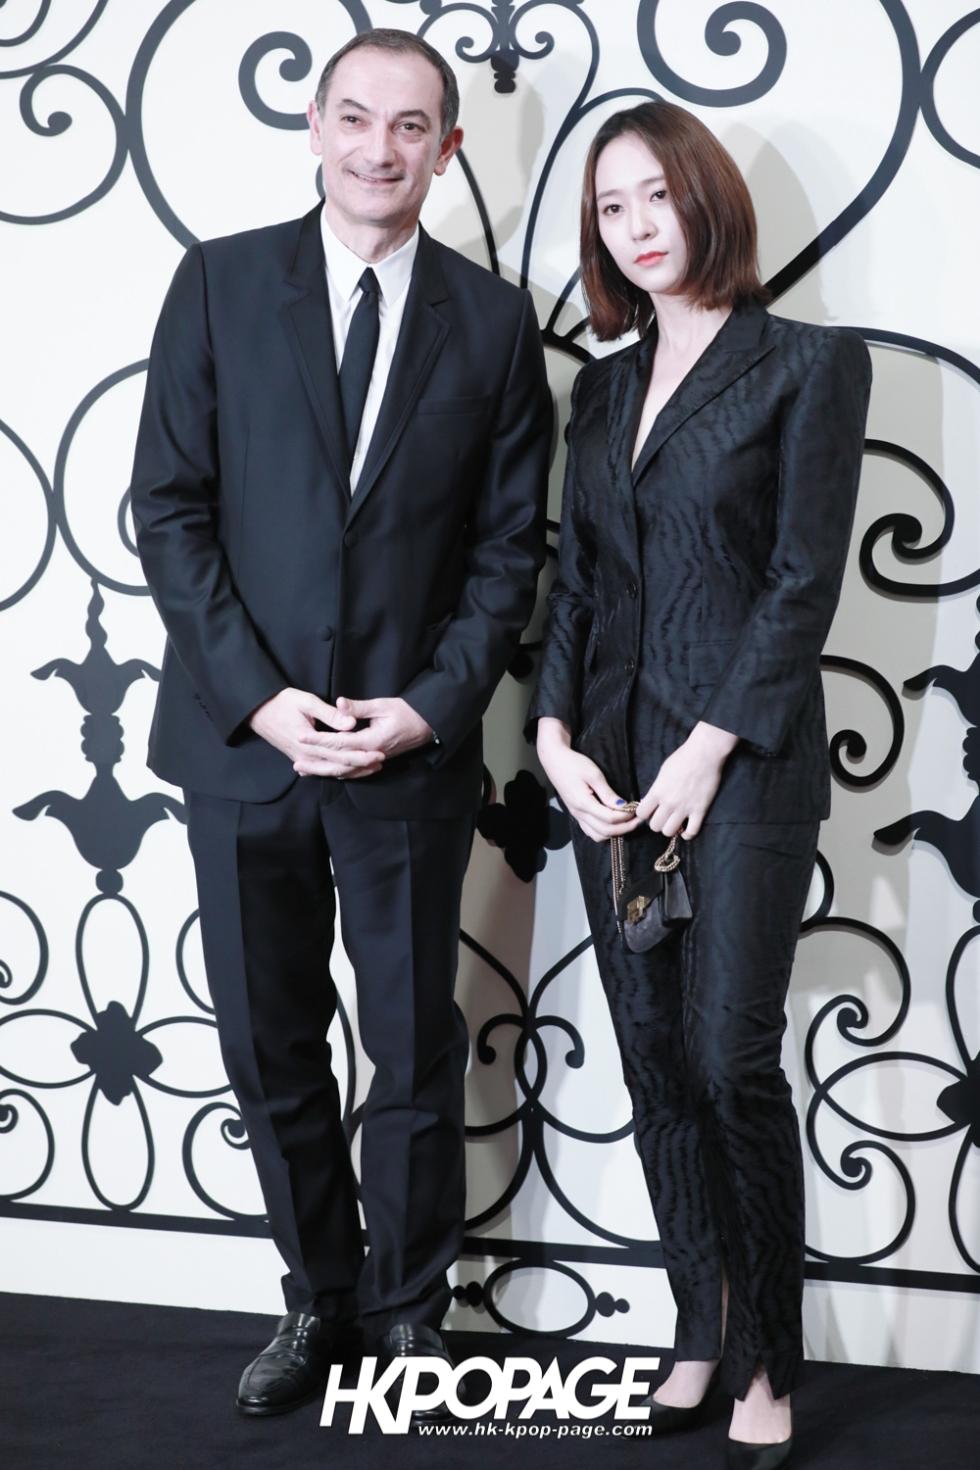 [HK.KPOP.PAGE] 180315_Krystal_Givenchy Event_10